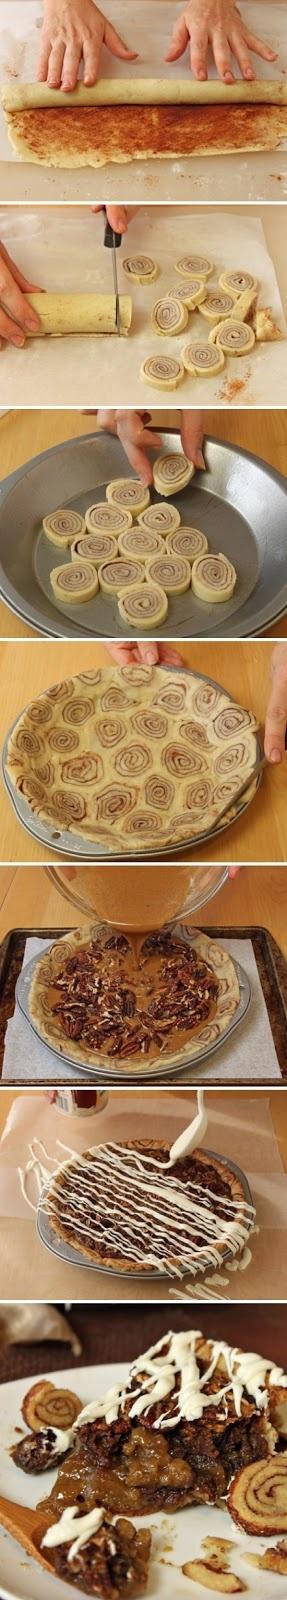 Healthy Food and Drinks : Cinnamon Bun Pecan Pie Oh heaven